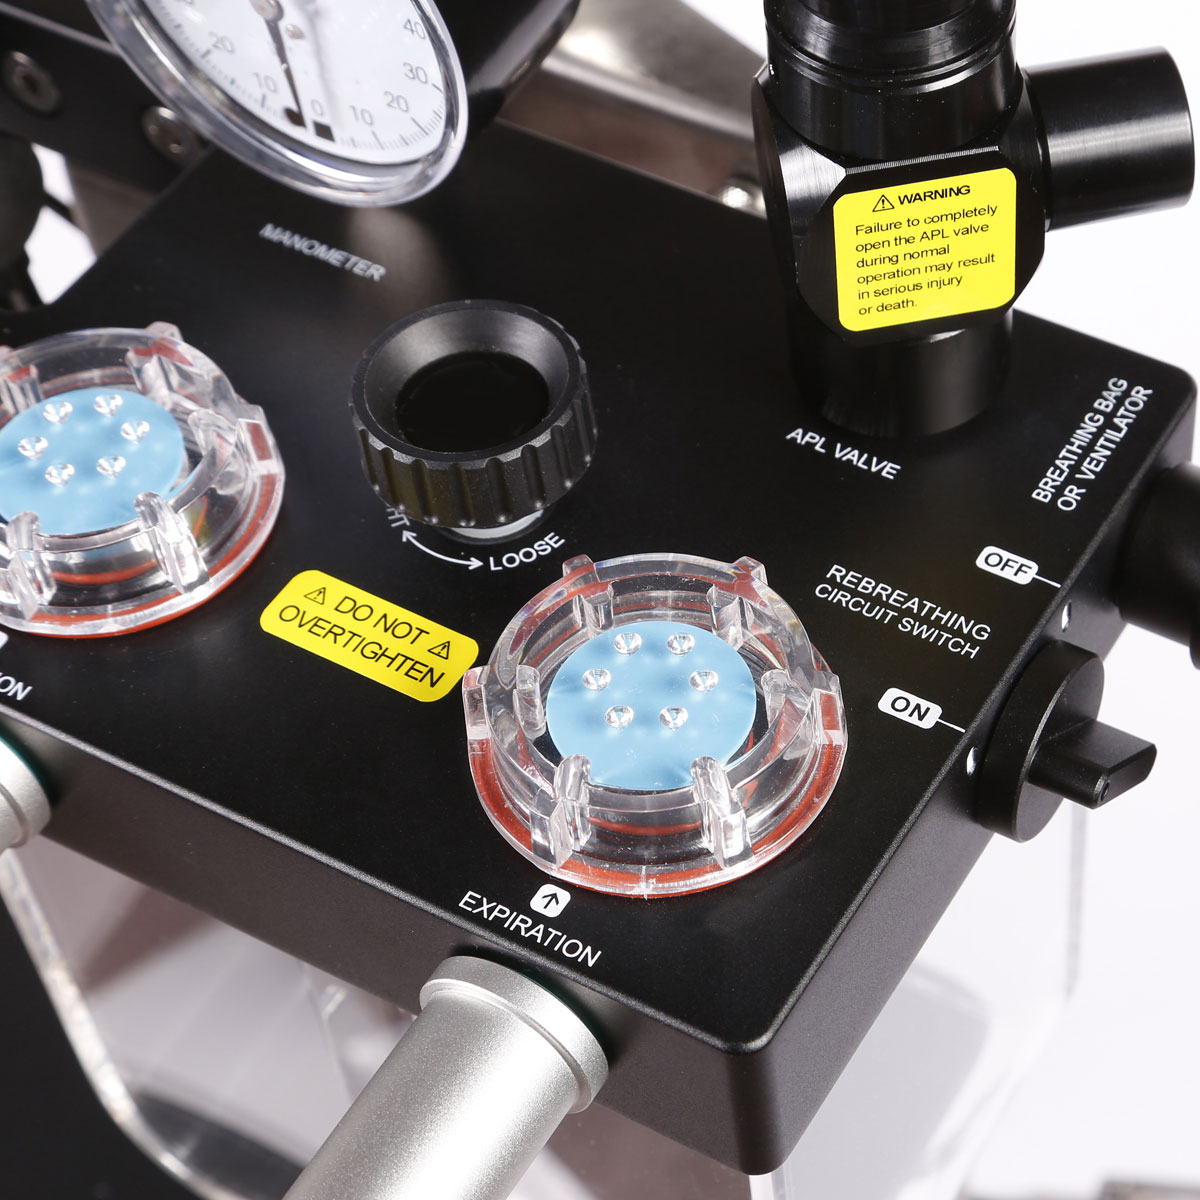 EZ-RB1000 Veterinary Anesthesia Machine